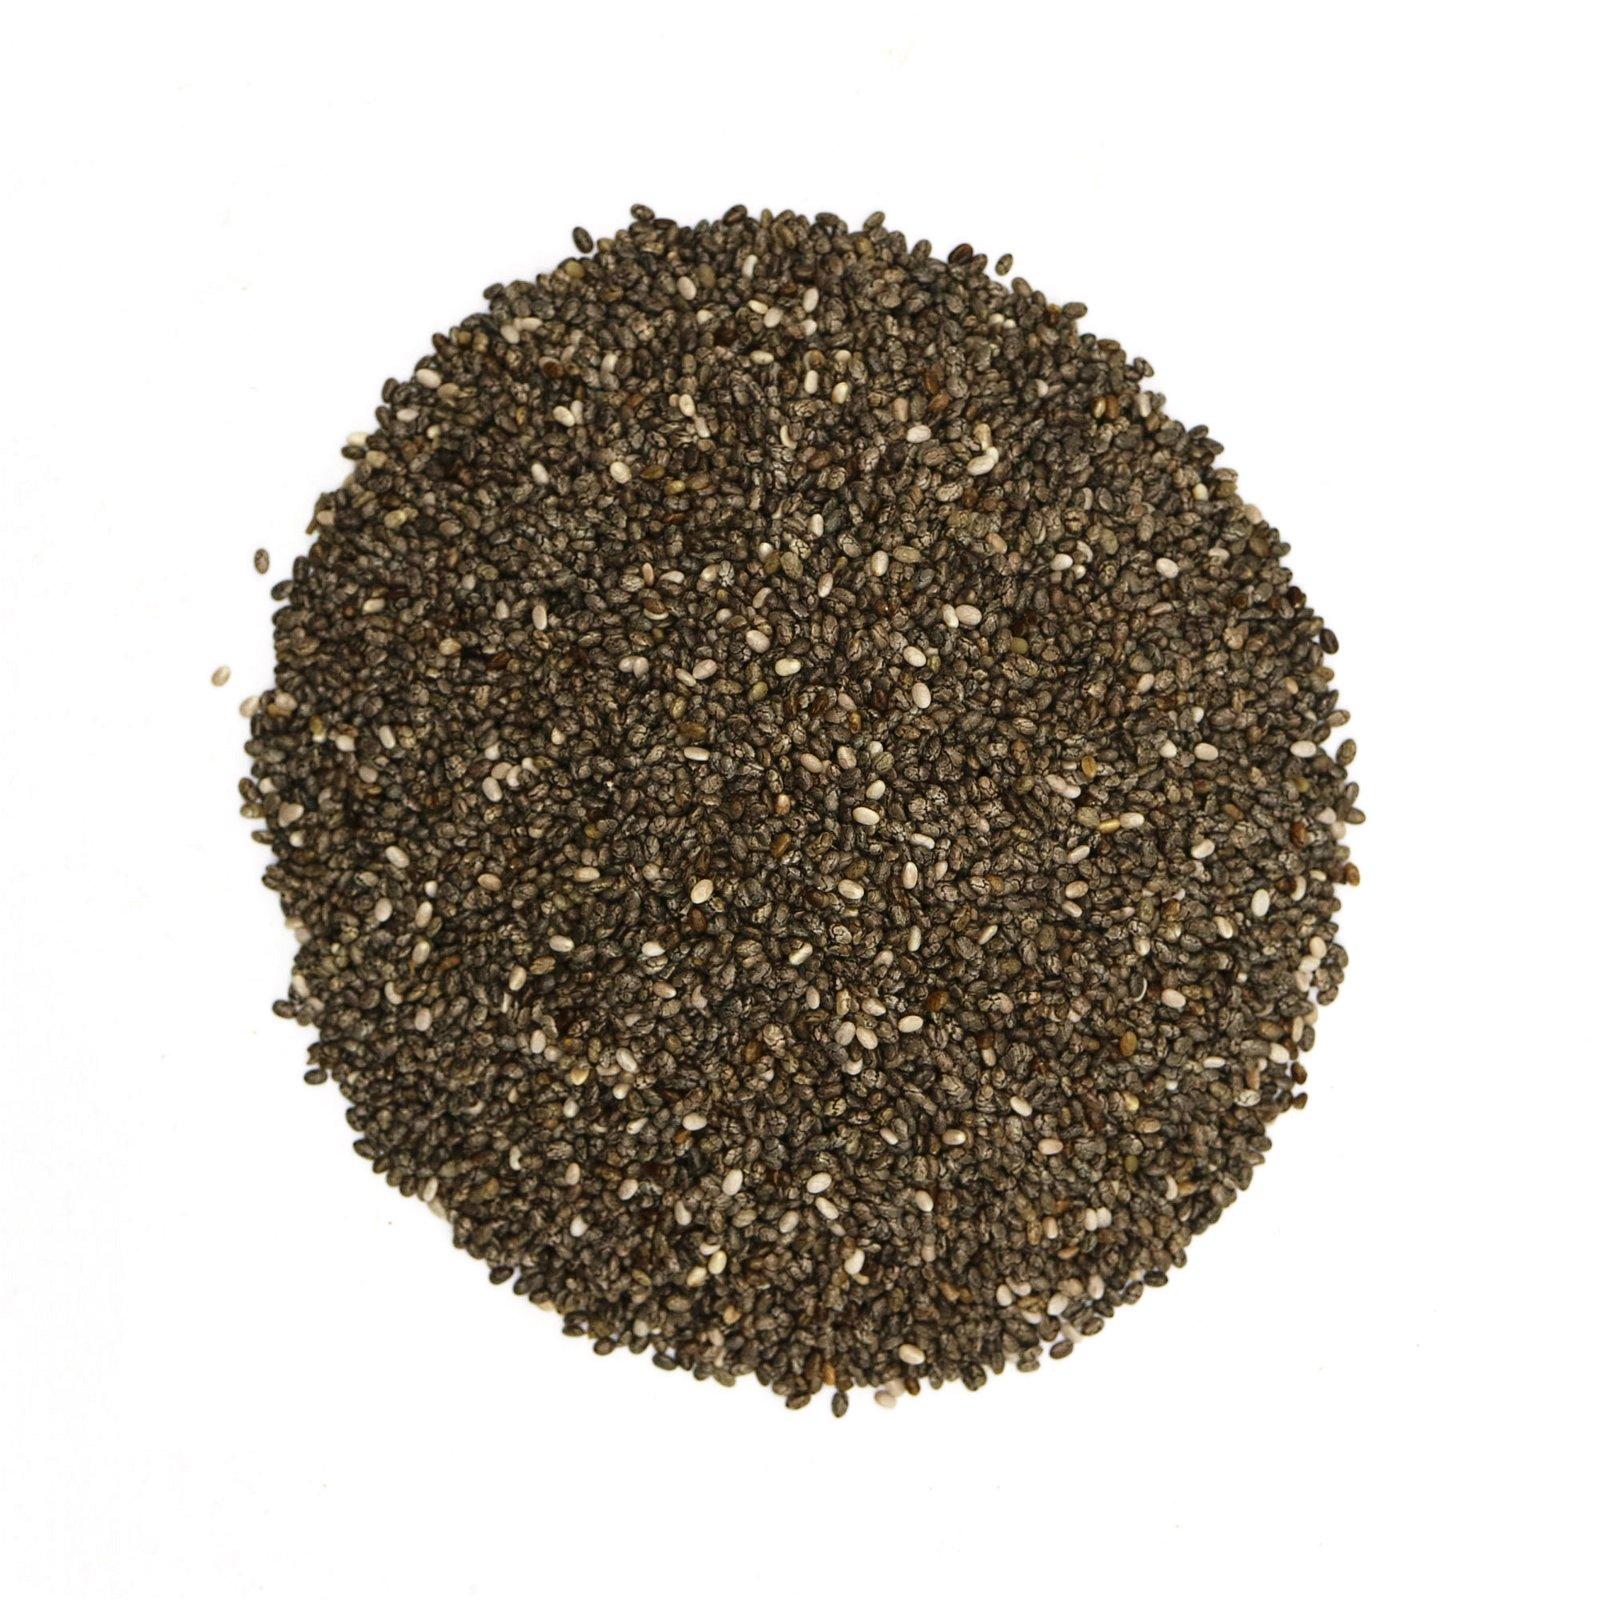 img-la-fourche-250g-de-graines-de-chia-bio-en-vrac